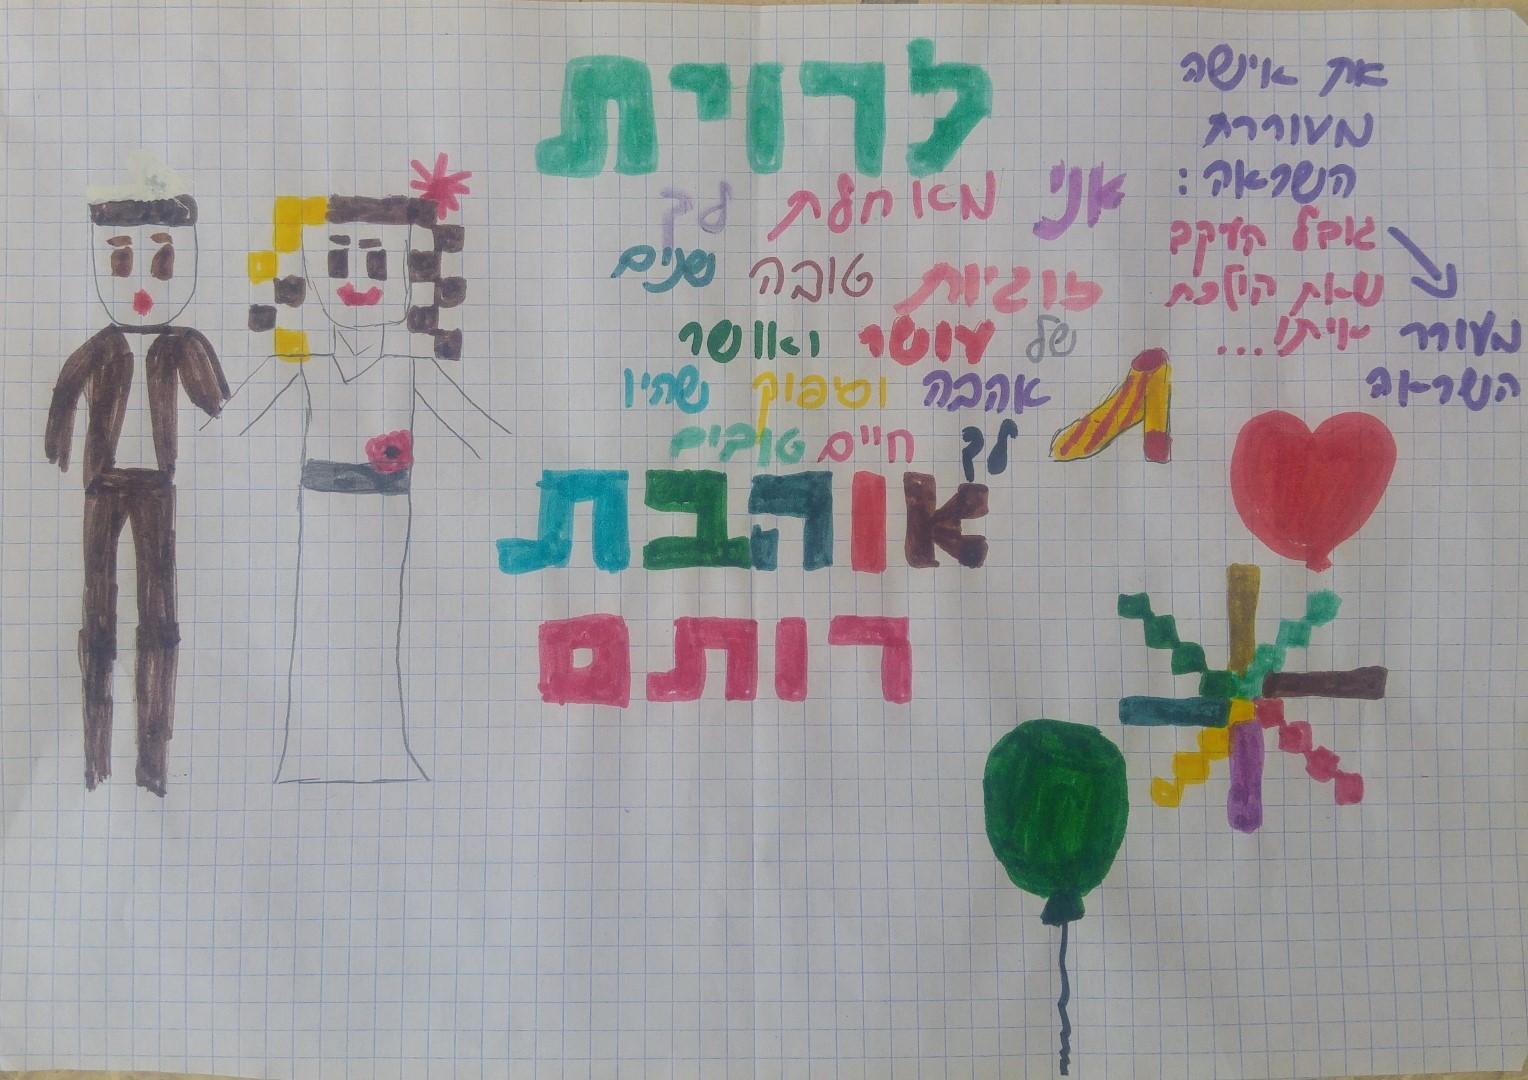 Artwork from the book - ברכות לחתונה של רוית ומשה באהבה מתלמידי כיתה ד4 by אילן  - Ourboox.com